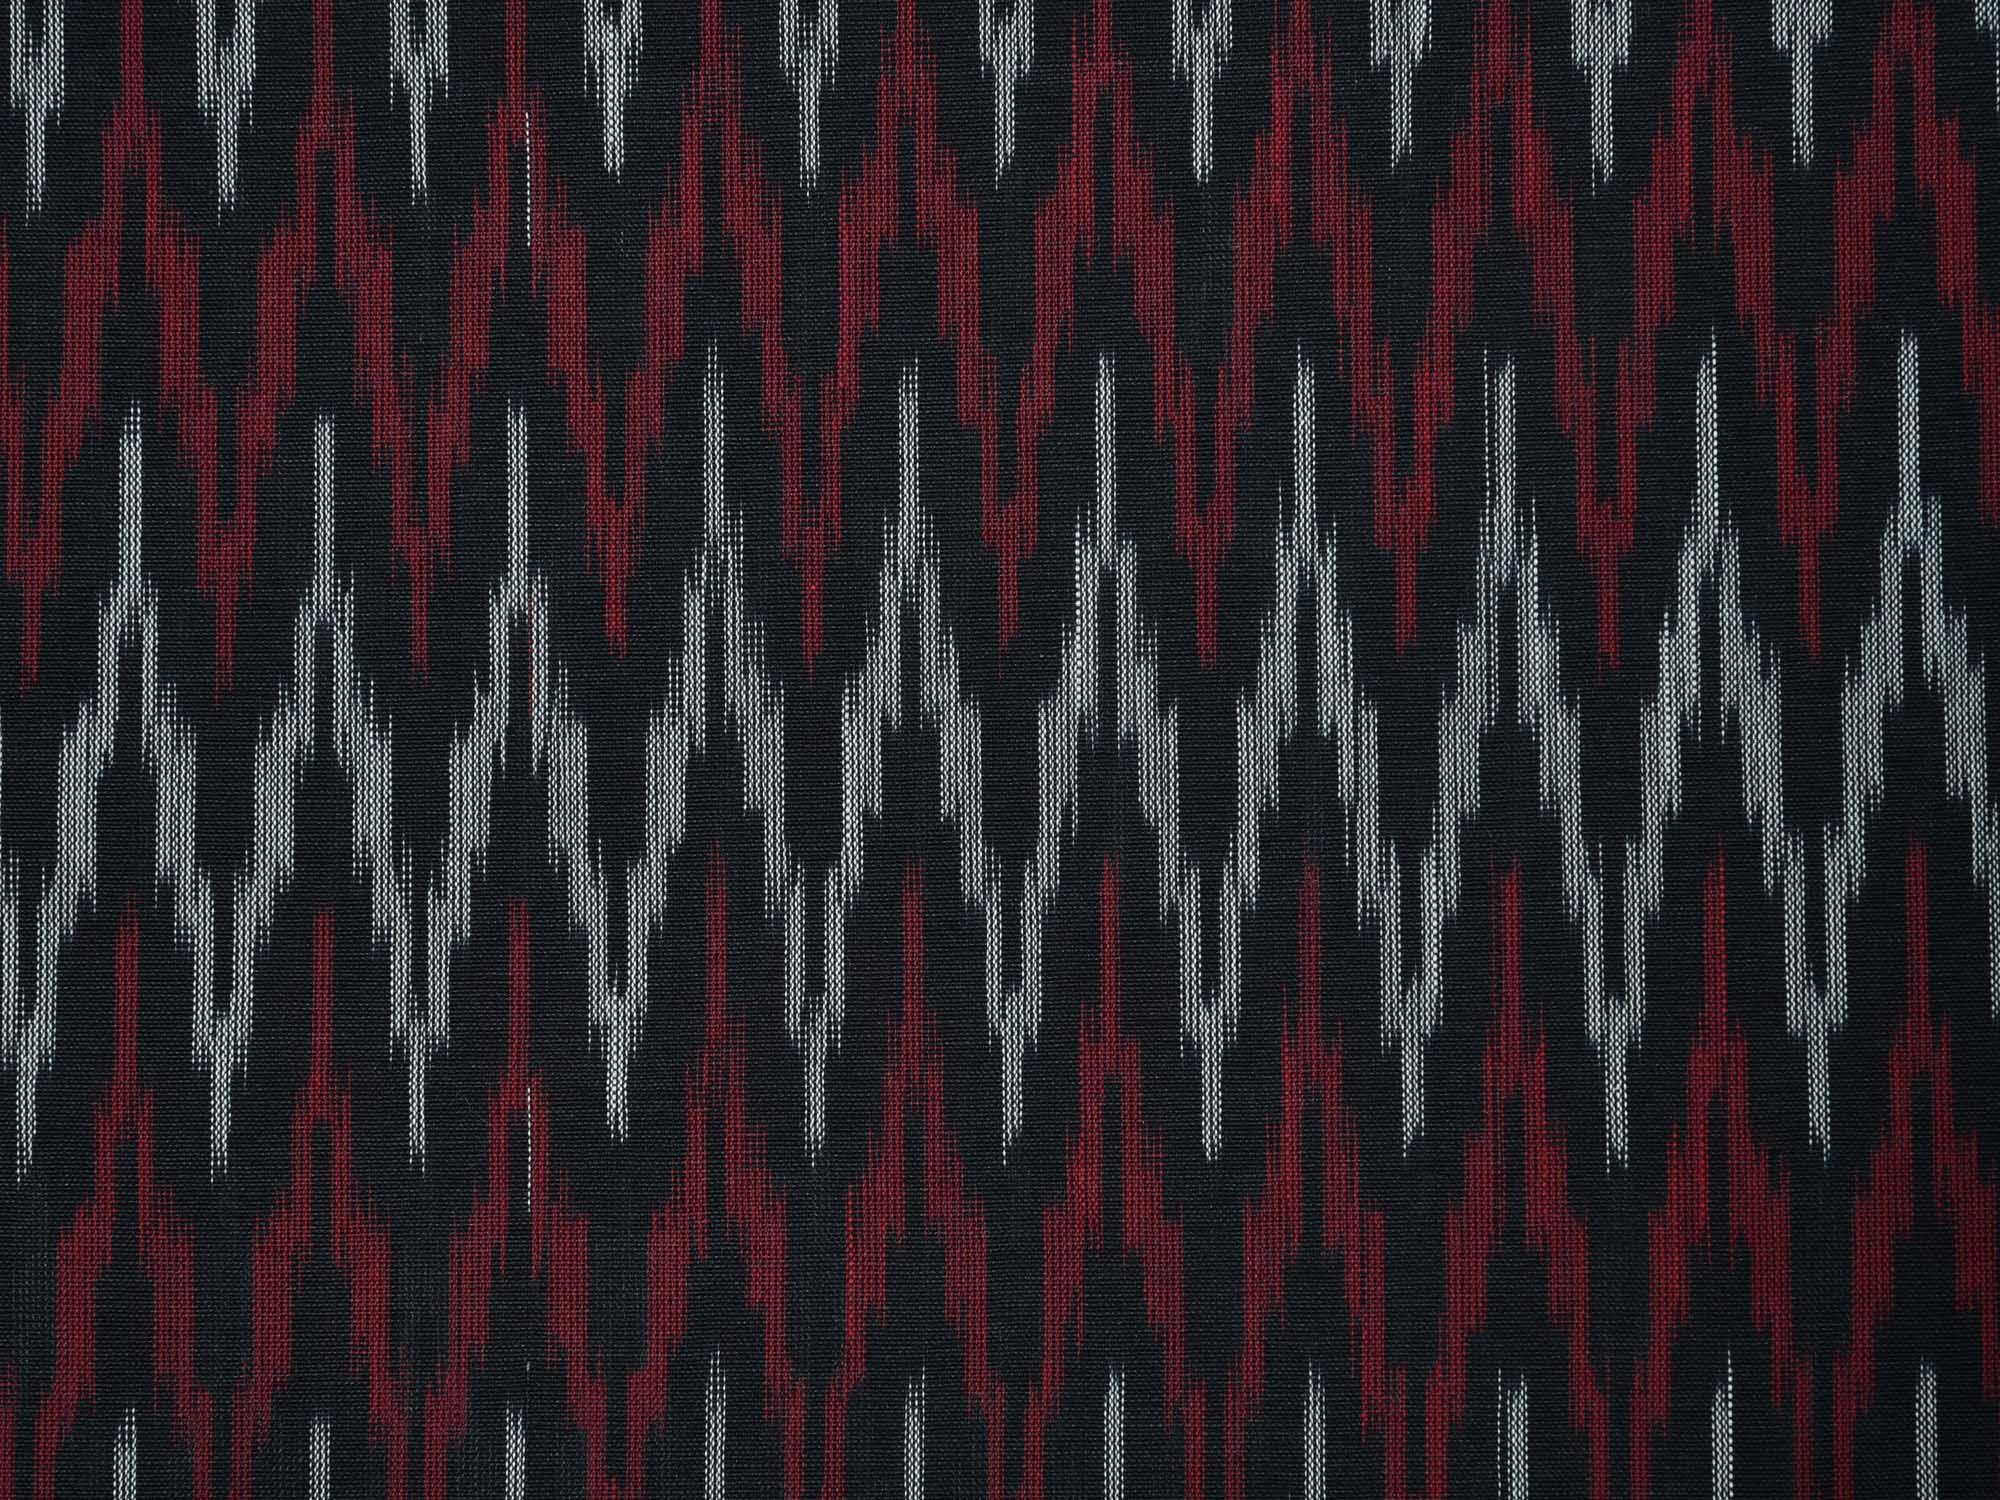 50d2ce1c71cf17 Maroon and Black Pochampally Ikat Cotton Handloom Saree with Zig-Zag Design  No Blouse - Uppada Sarees - 2782069